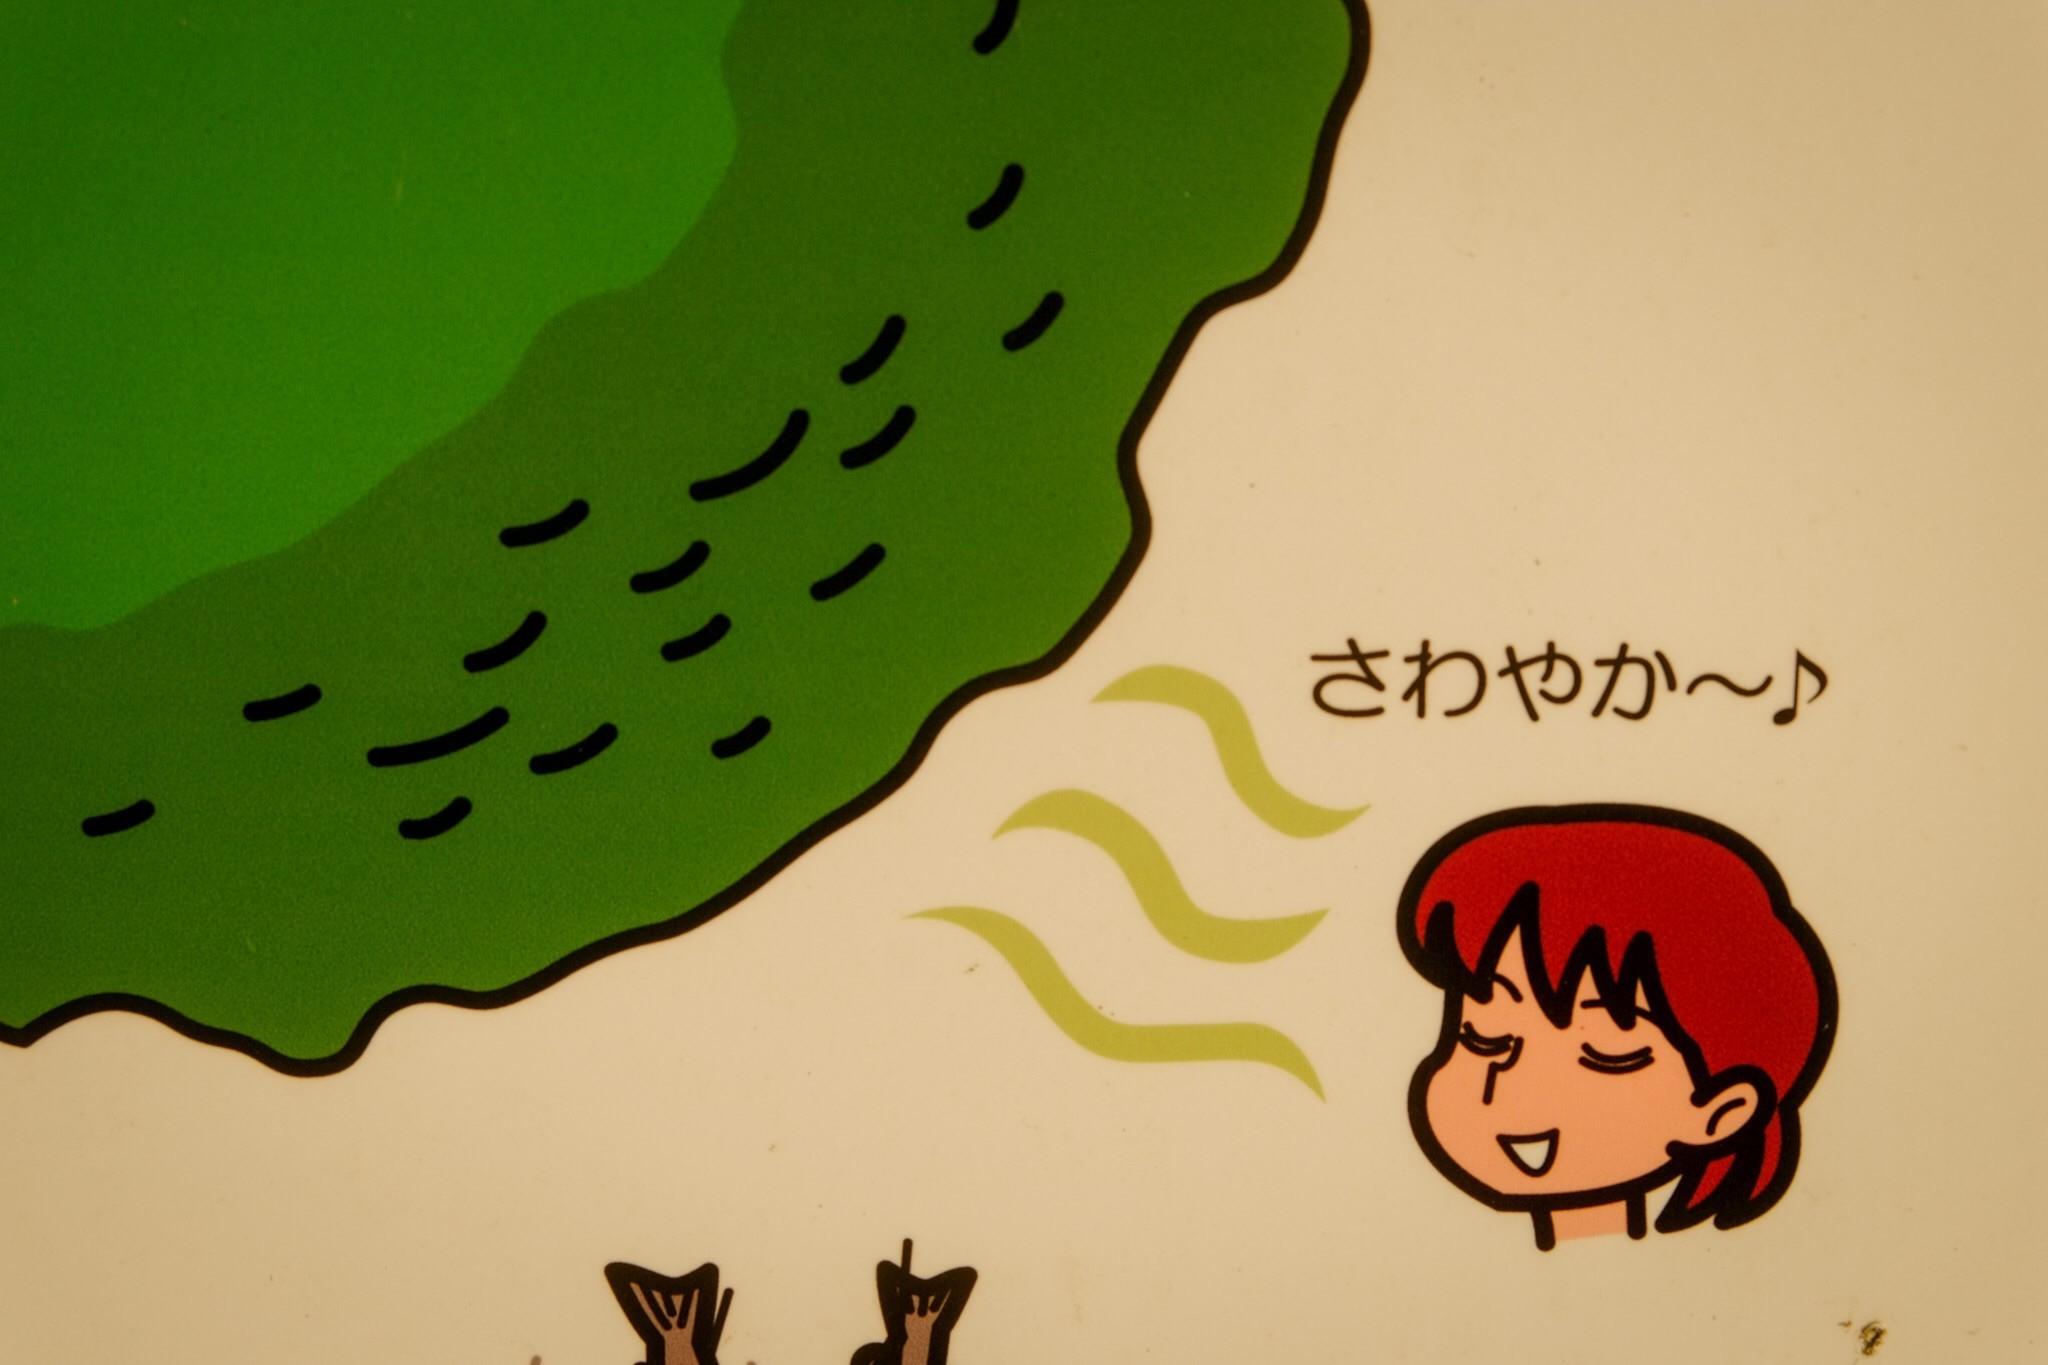 f:id:Yamadamado:20210118014837j:image